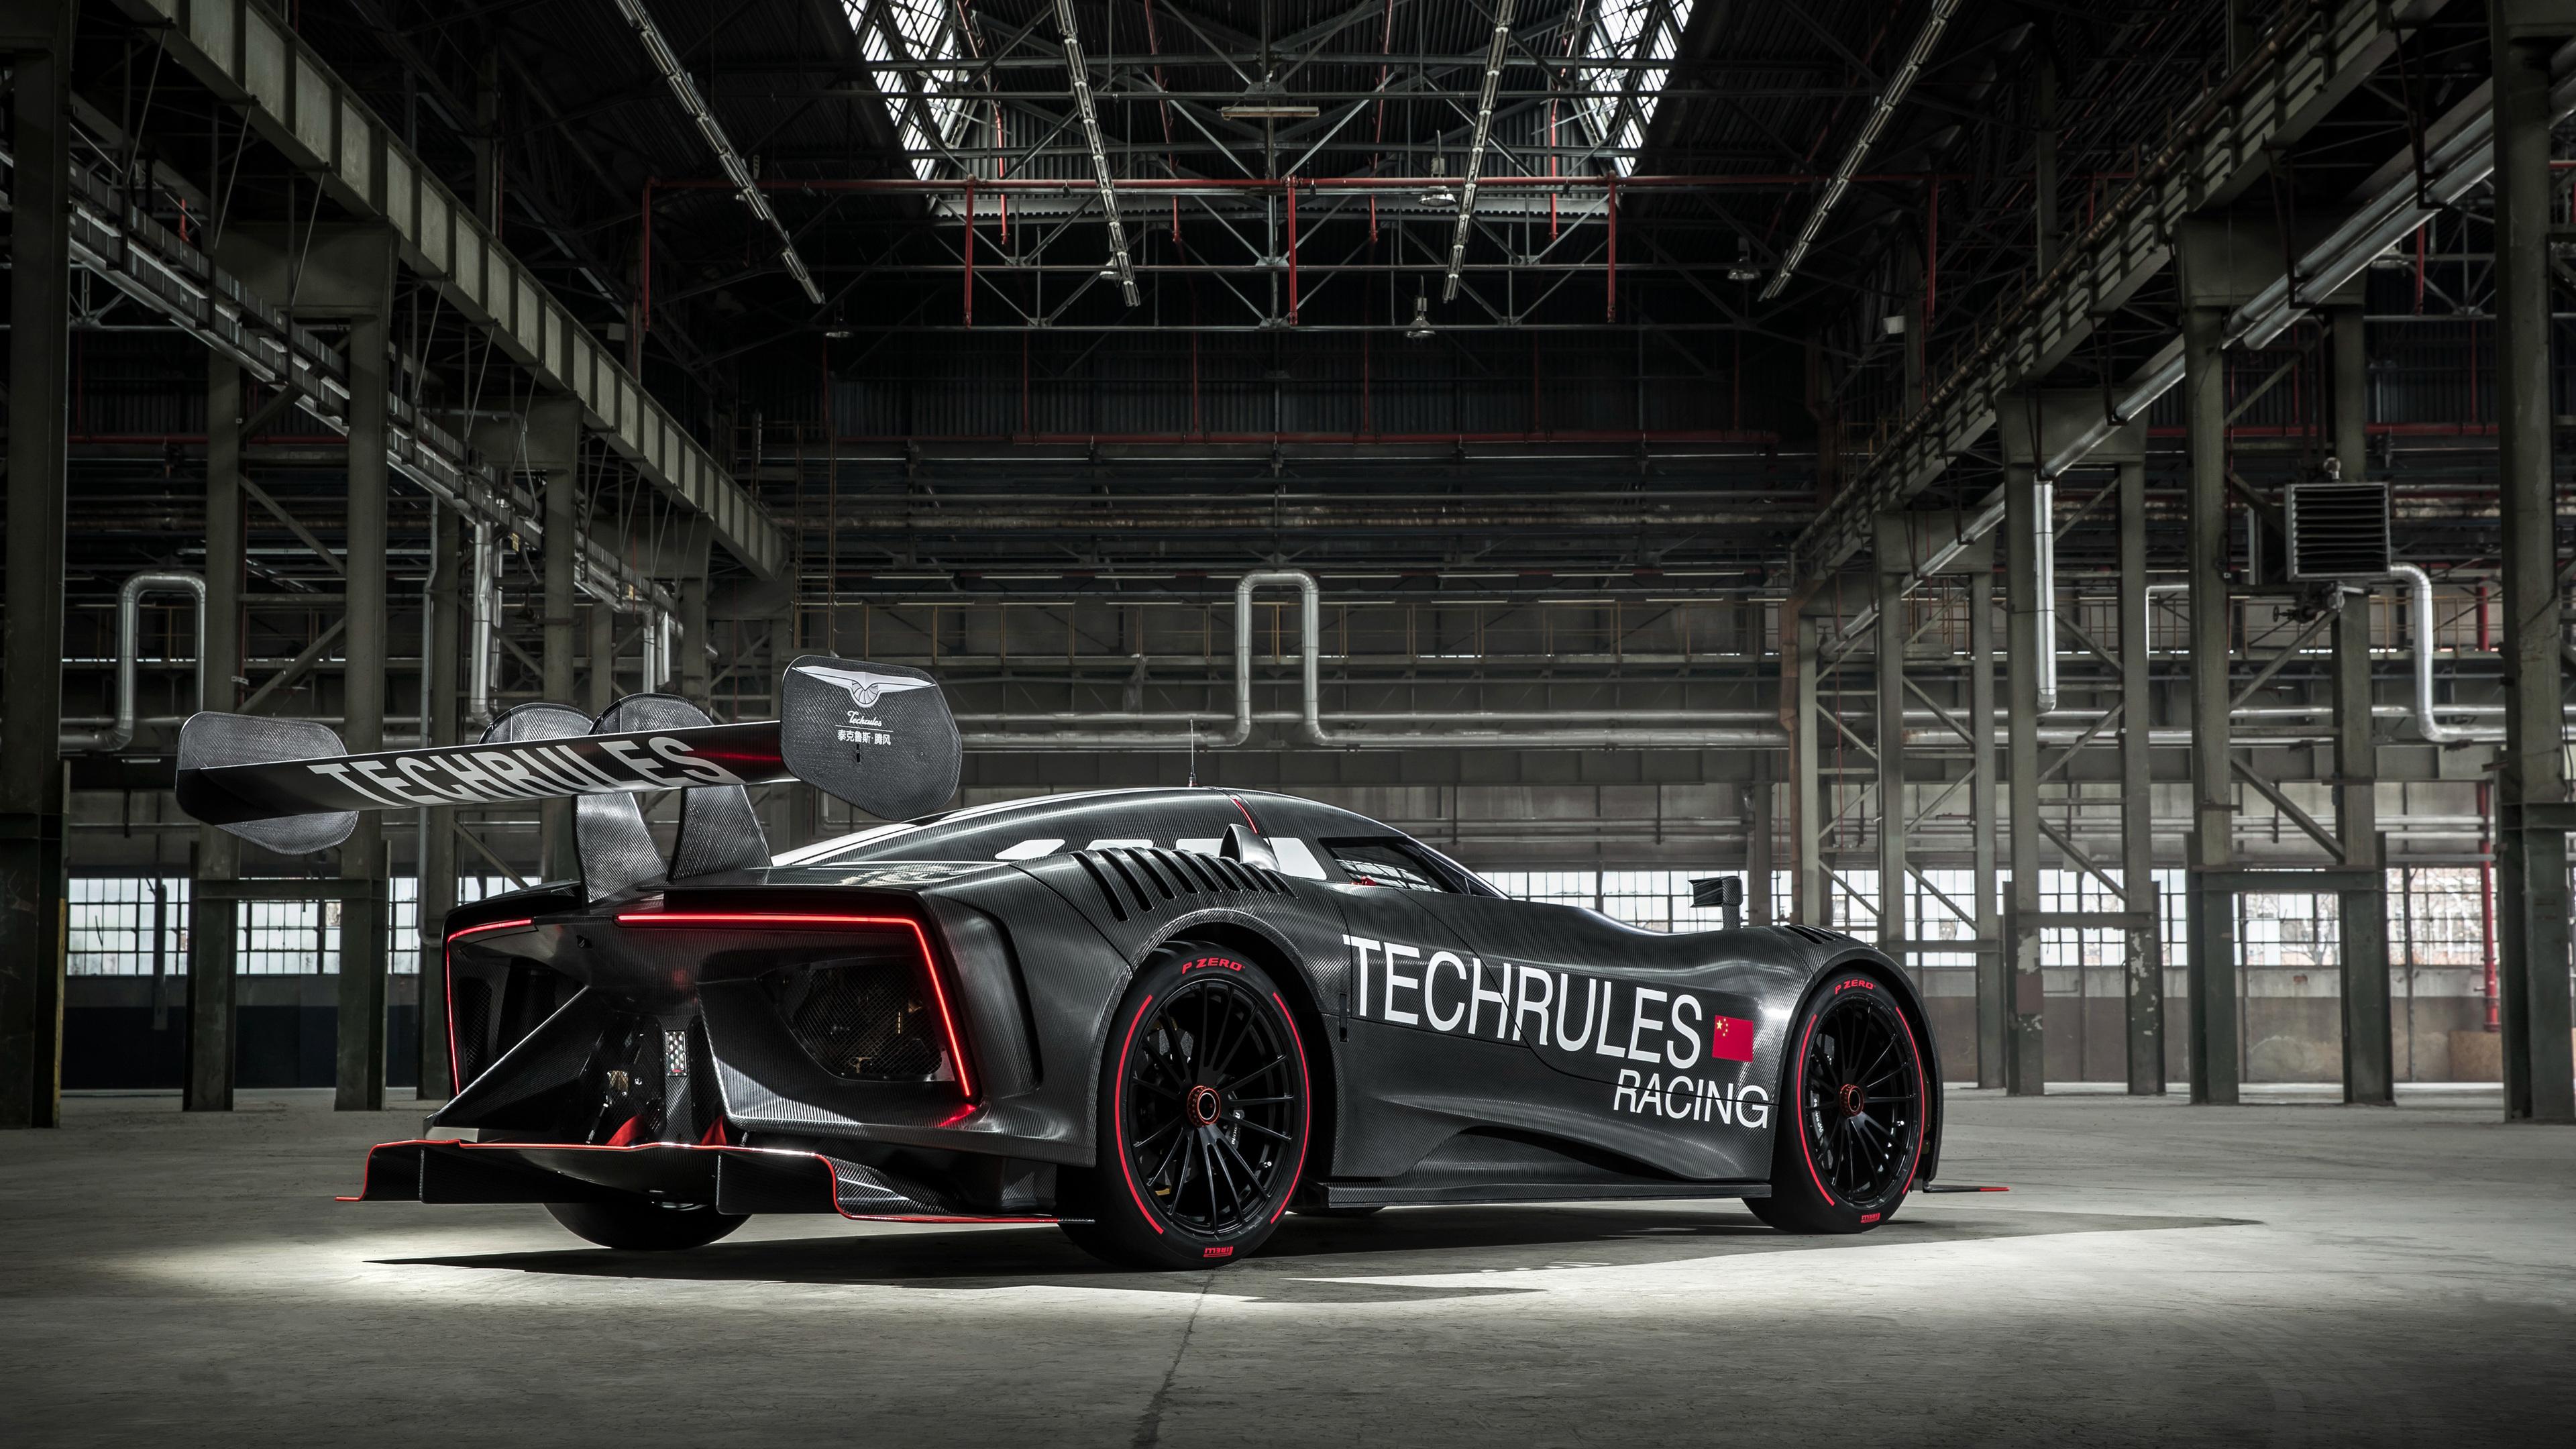 techrules ren rs 2018 rear 1539110133 - Techrules Ren RS 2018 Rear - techrules wallpapers, techrules ren rs wallpapers, hd-wallpapers, cars wallpapers, 4k-wallpapers, 2018 cars wallpapers